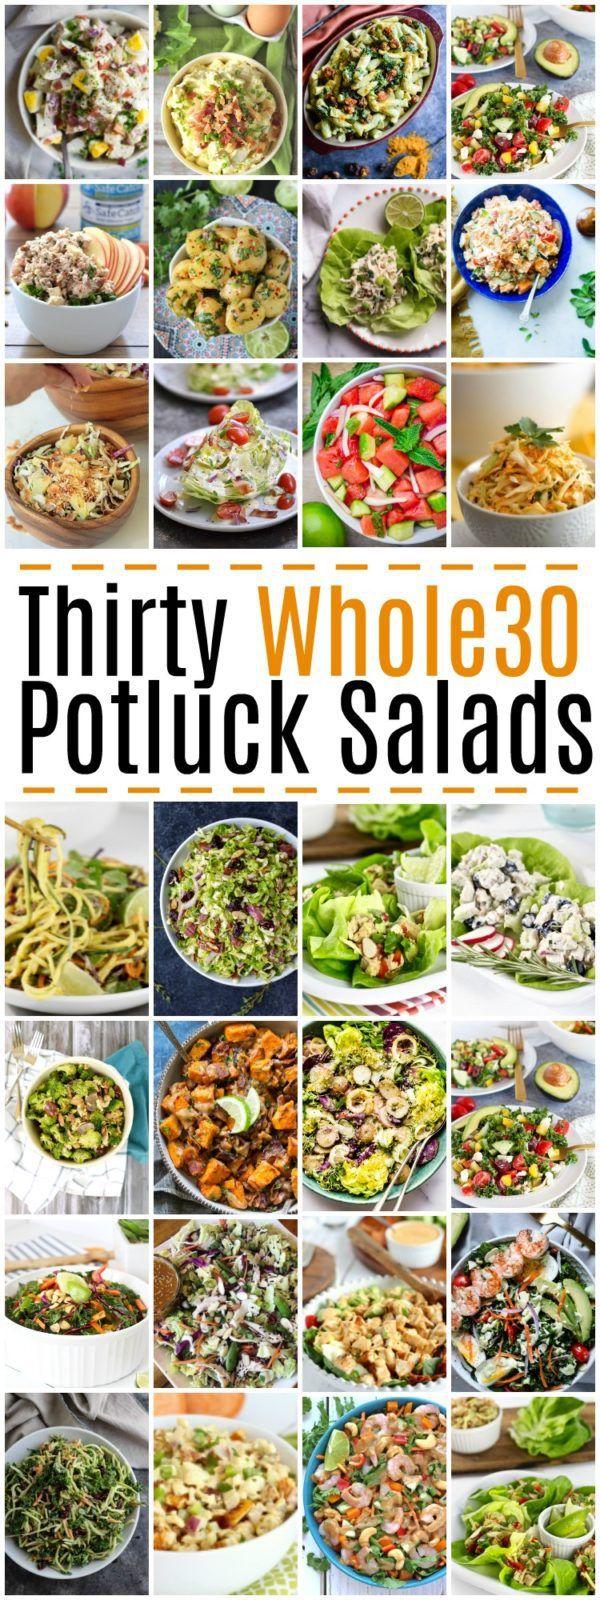 30 Whole30 Potluck Salads #whole30recipes